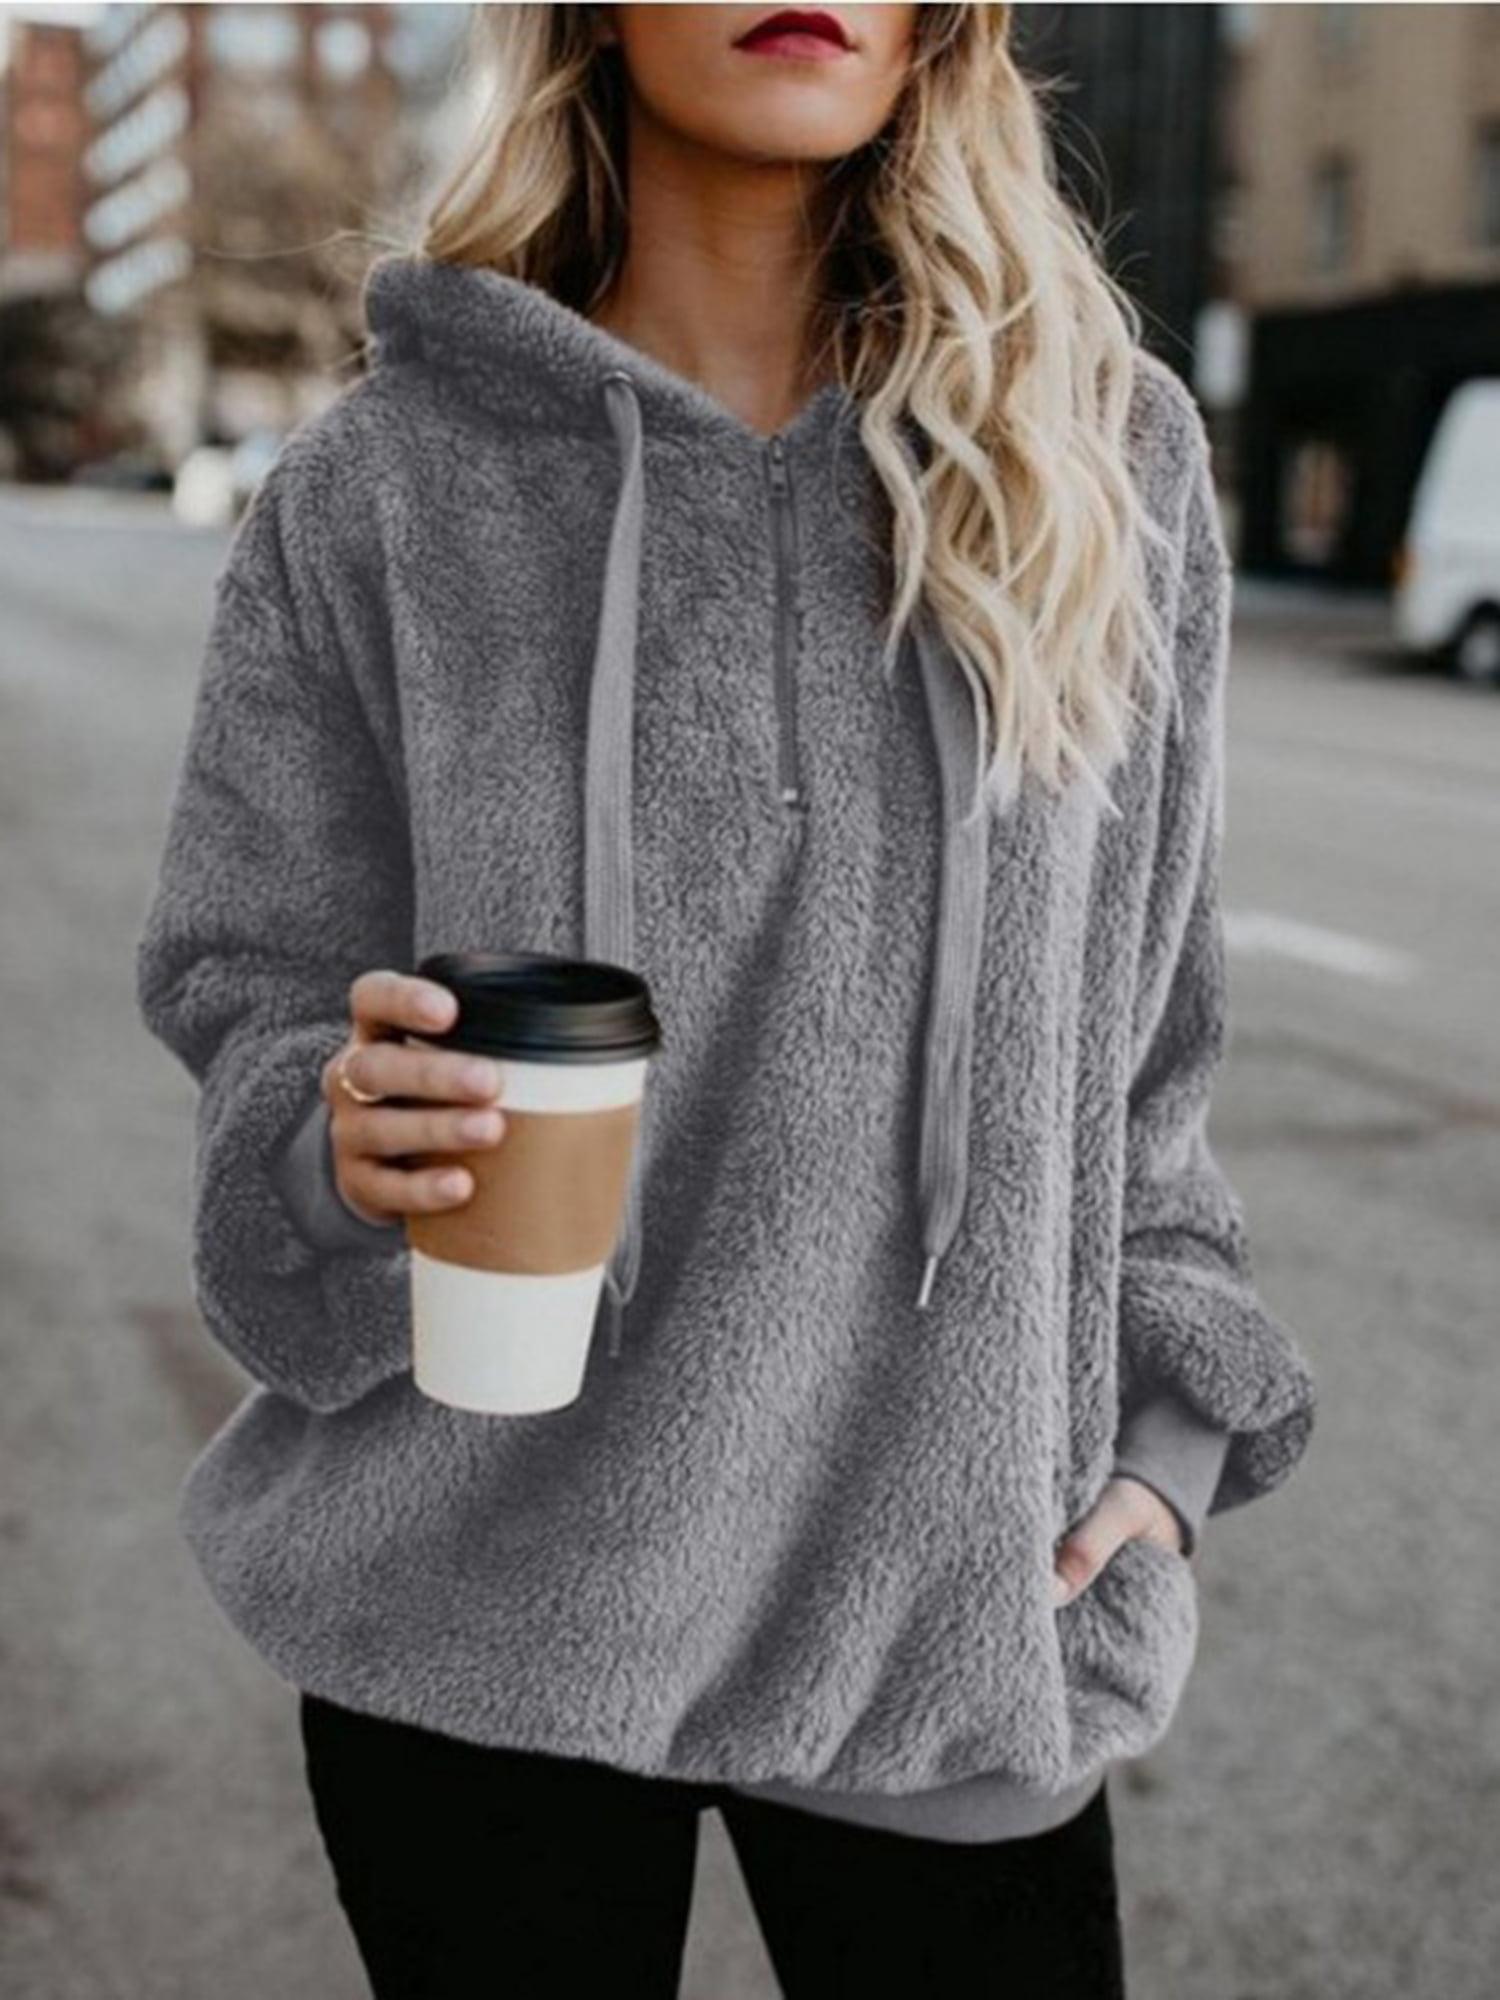 sweatshirts for women